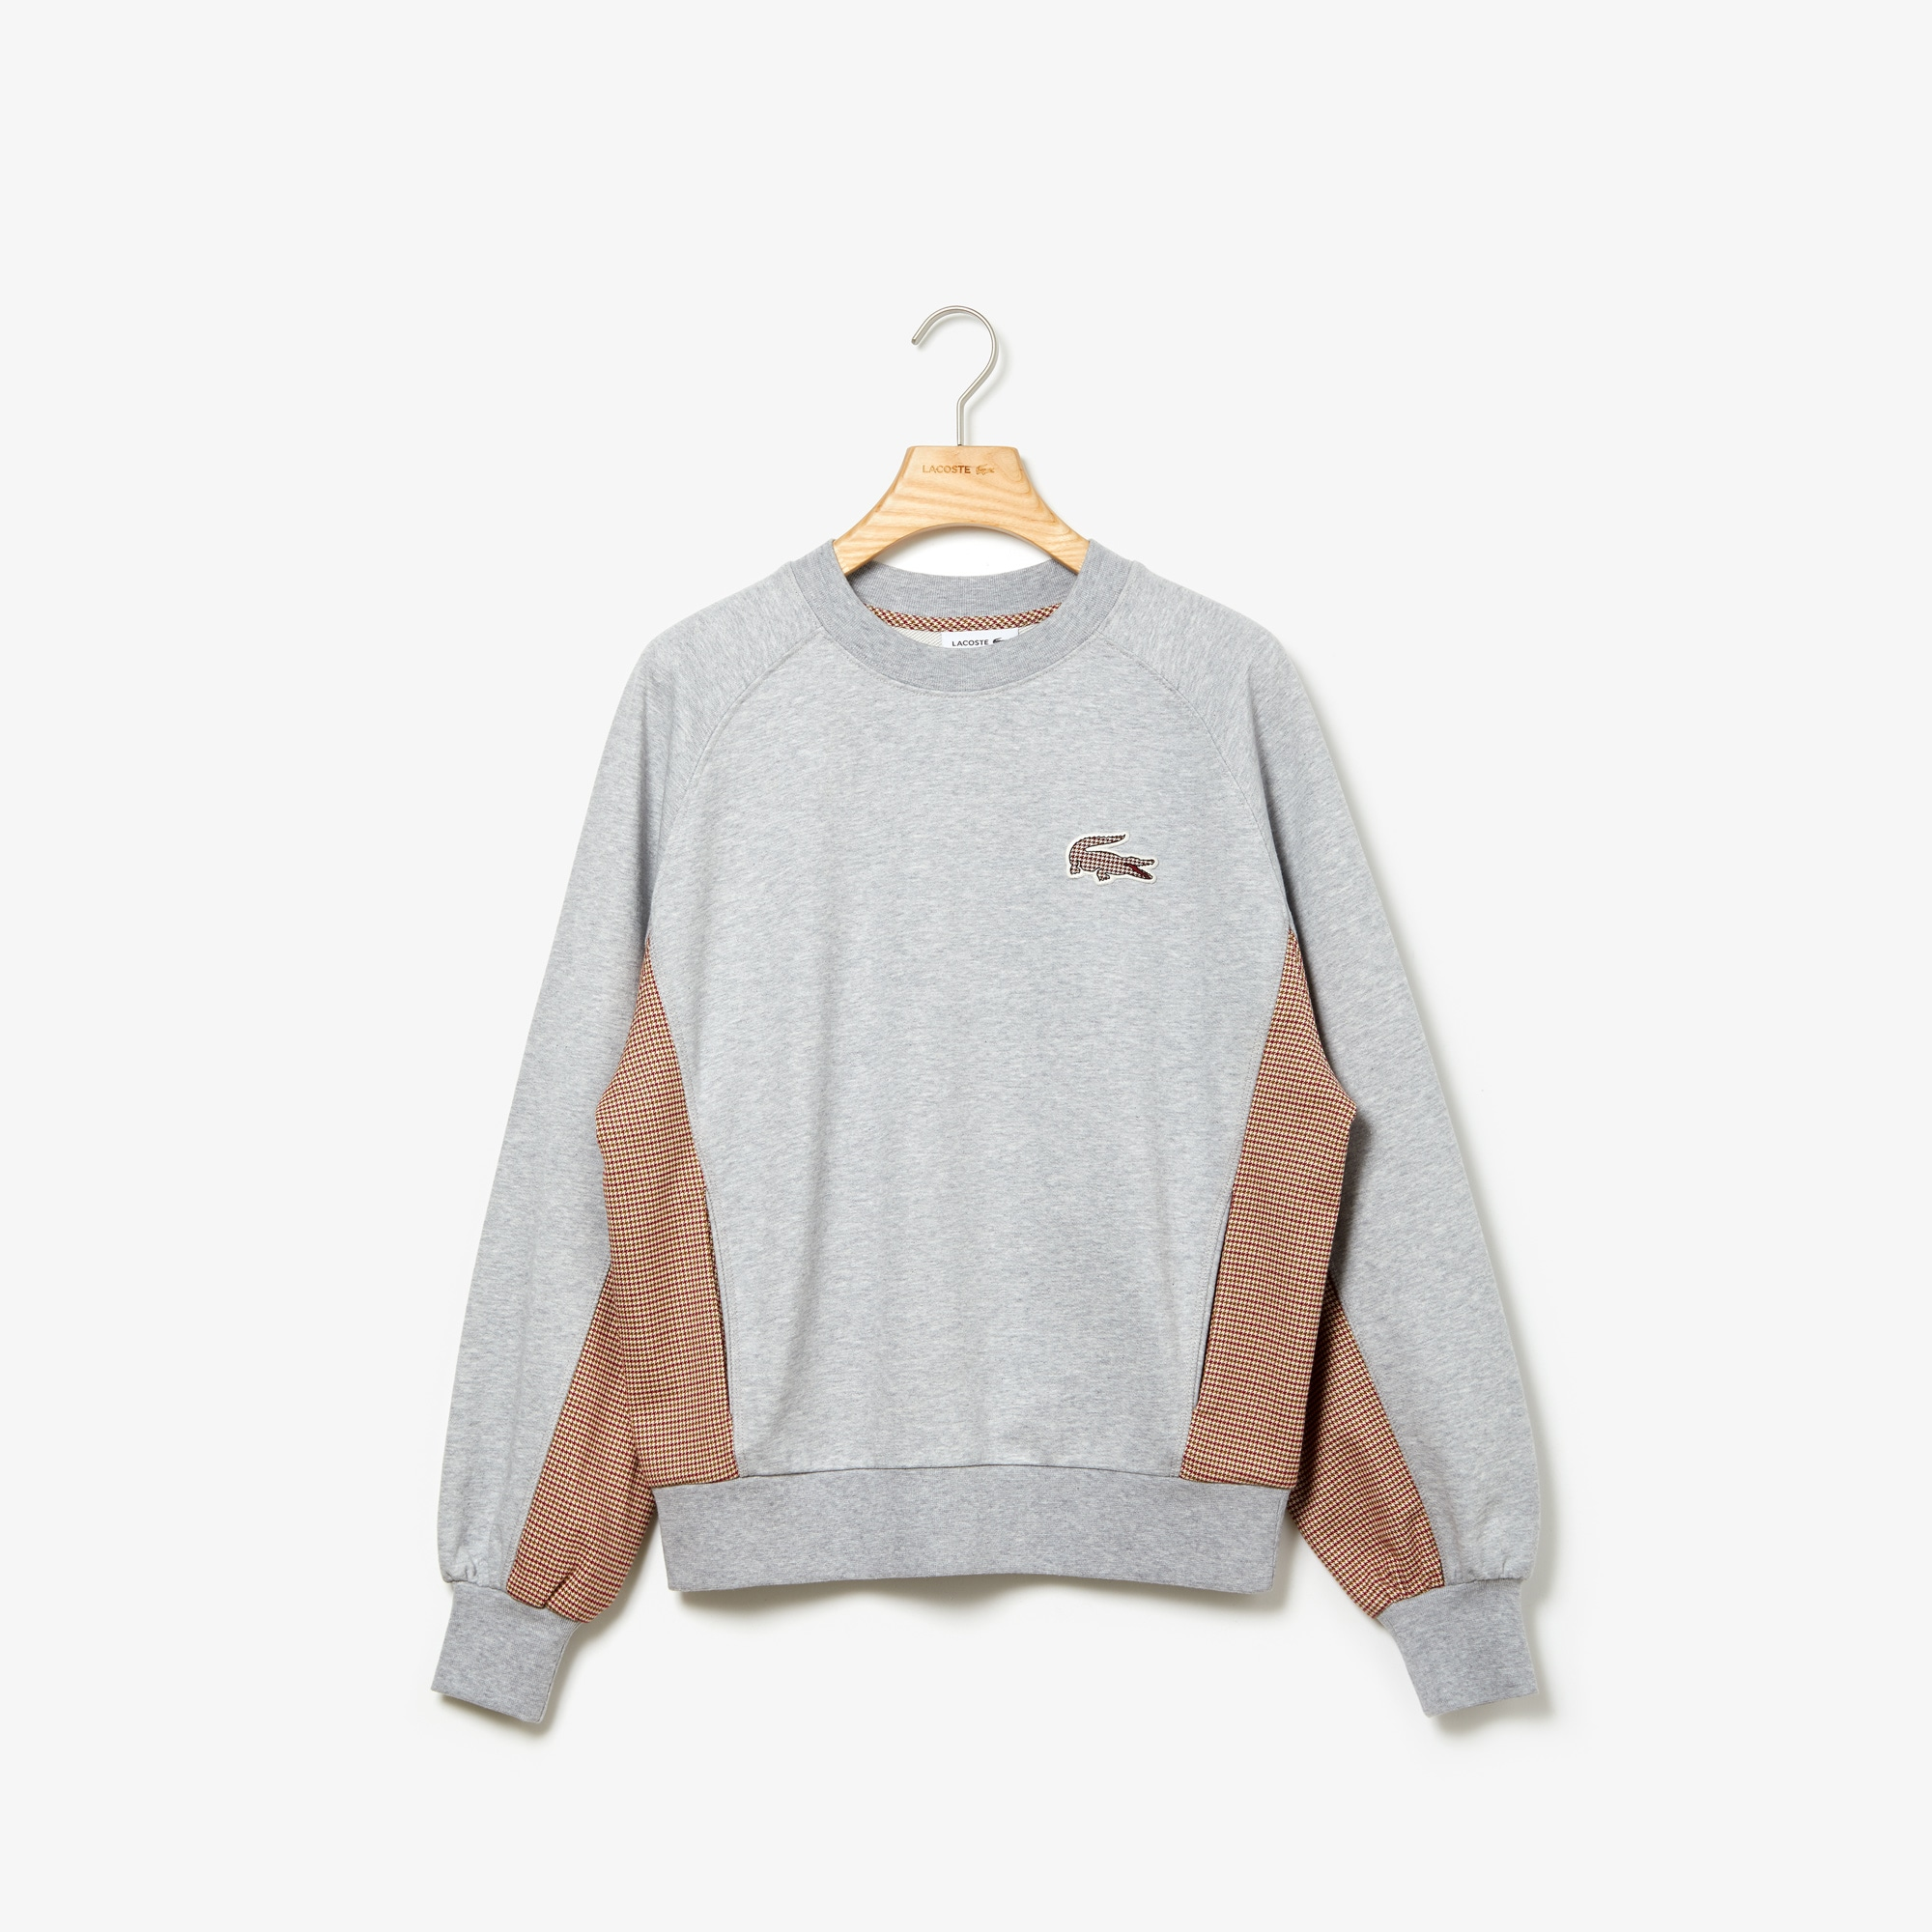 Lacoste Tops Women's Crewneck Check-Paneled Sweatshirt